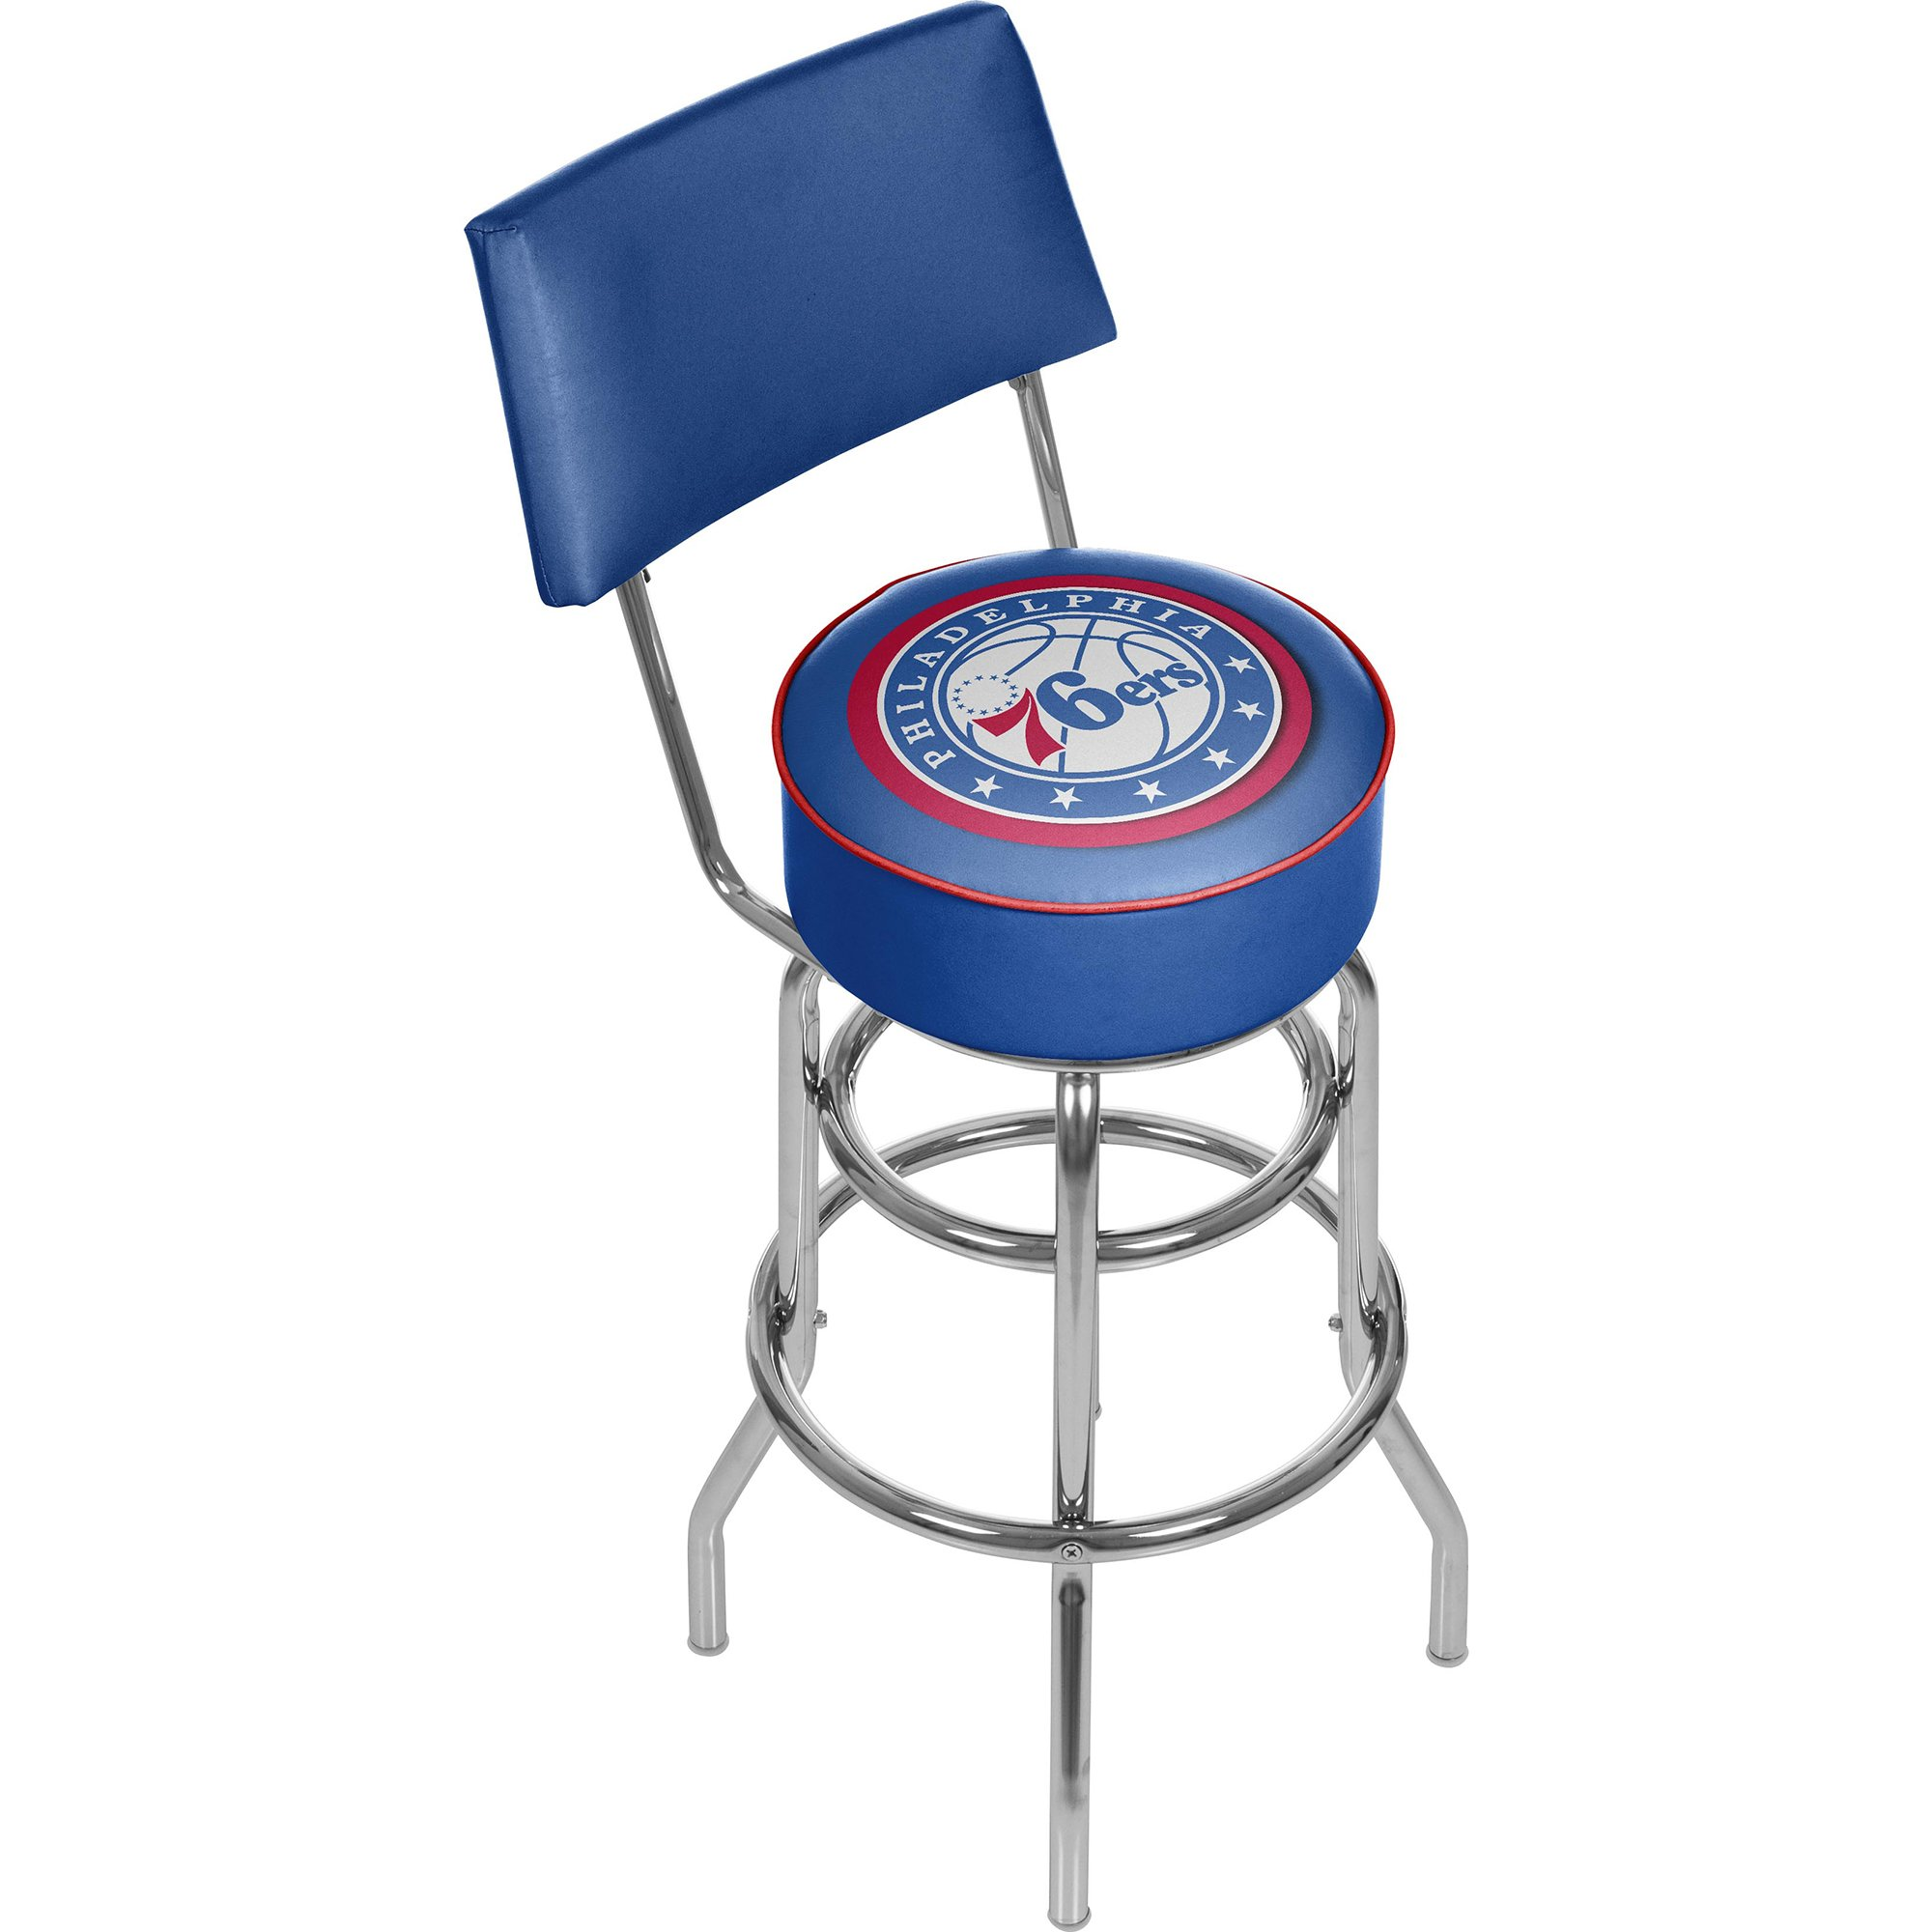 Trademark Gameroom NBA Philadelphia 76ers Padded Swivel Bar Stool with Back by Trademark Gameroom